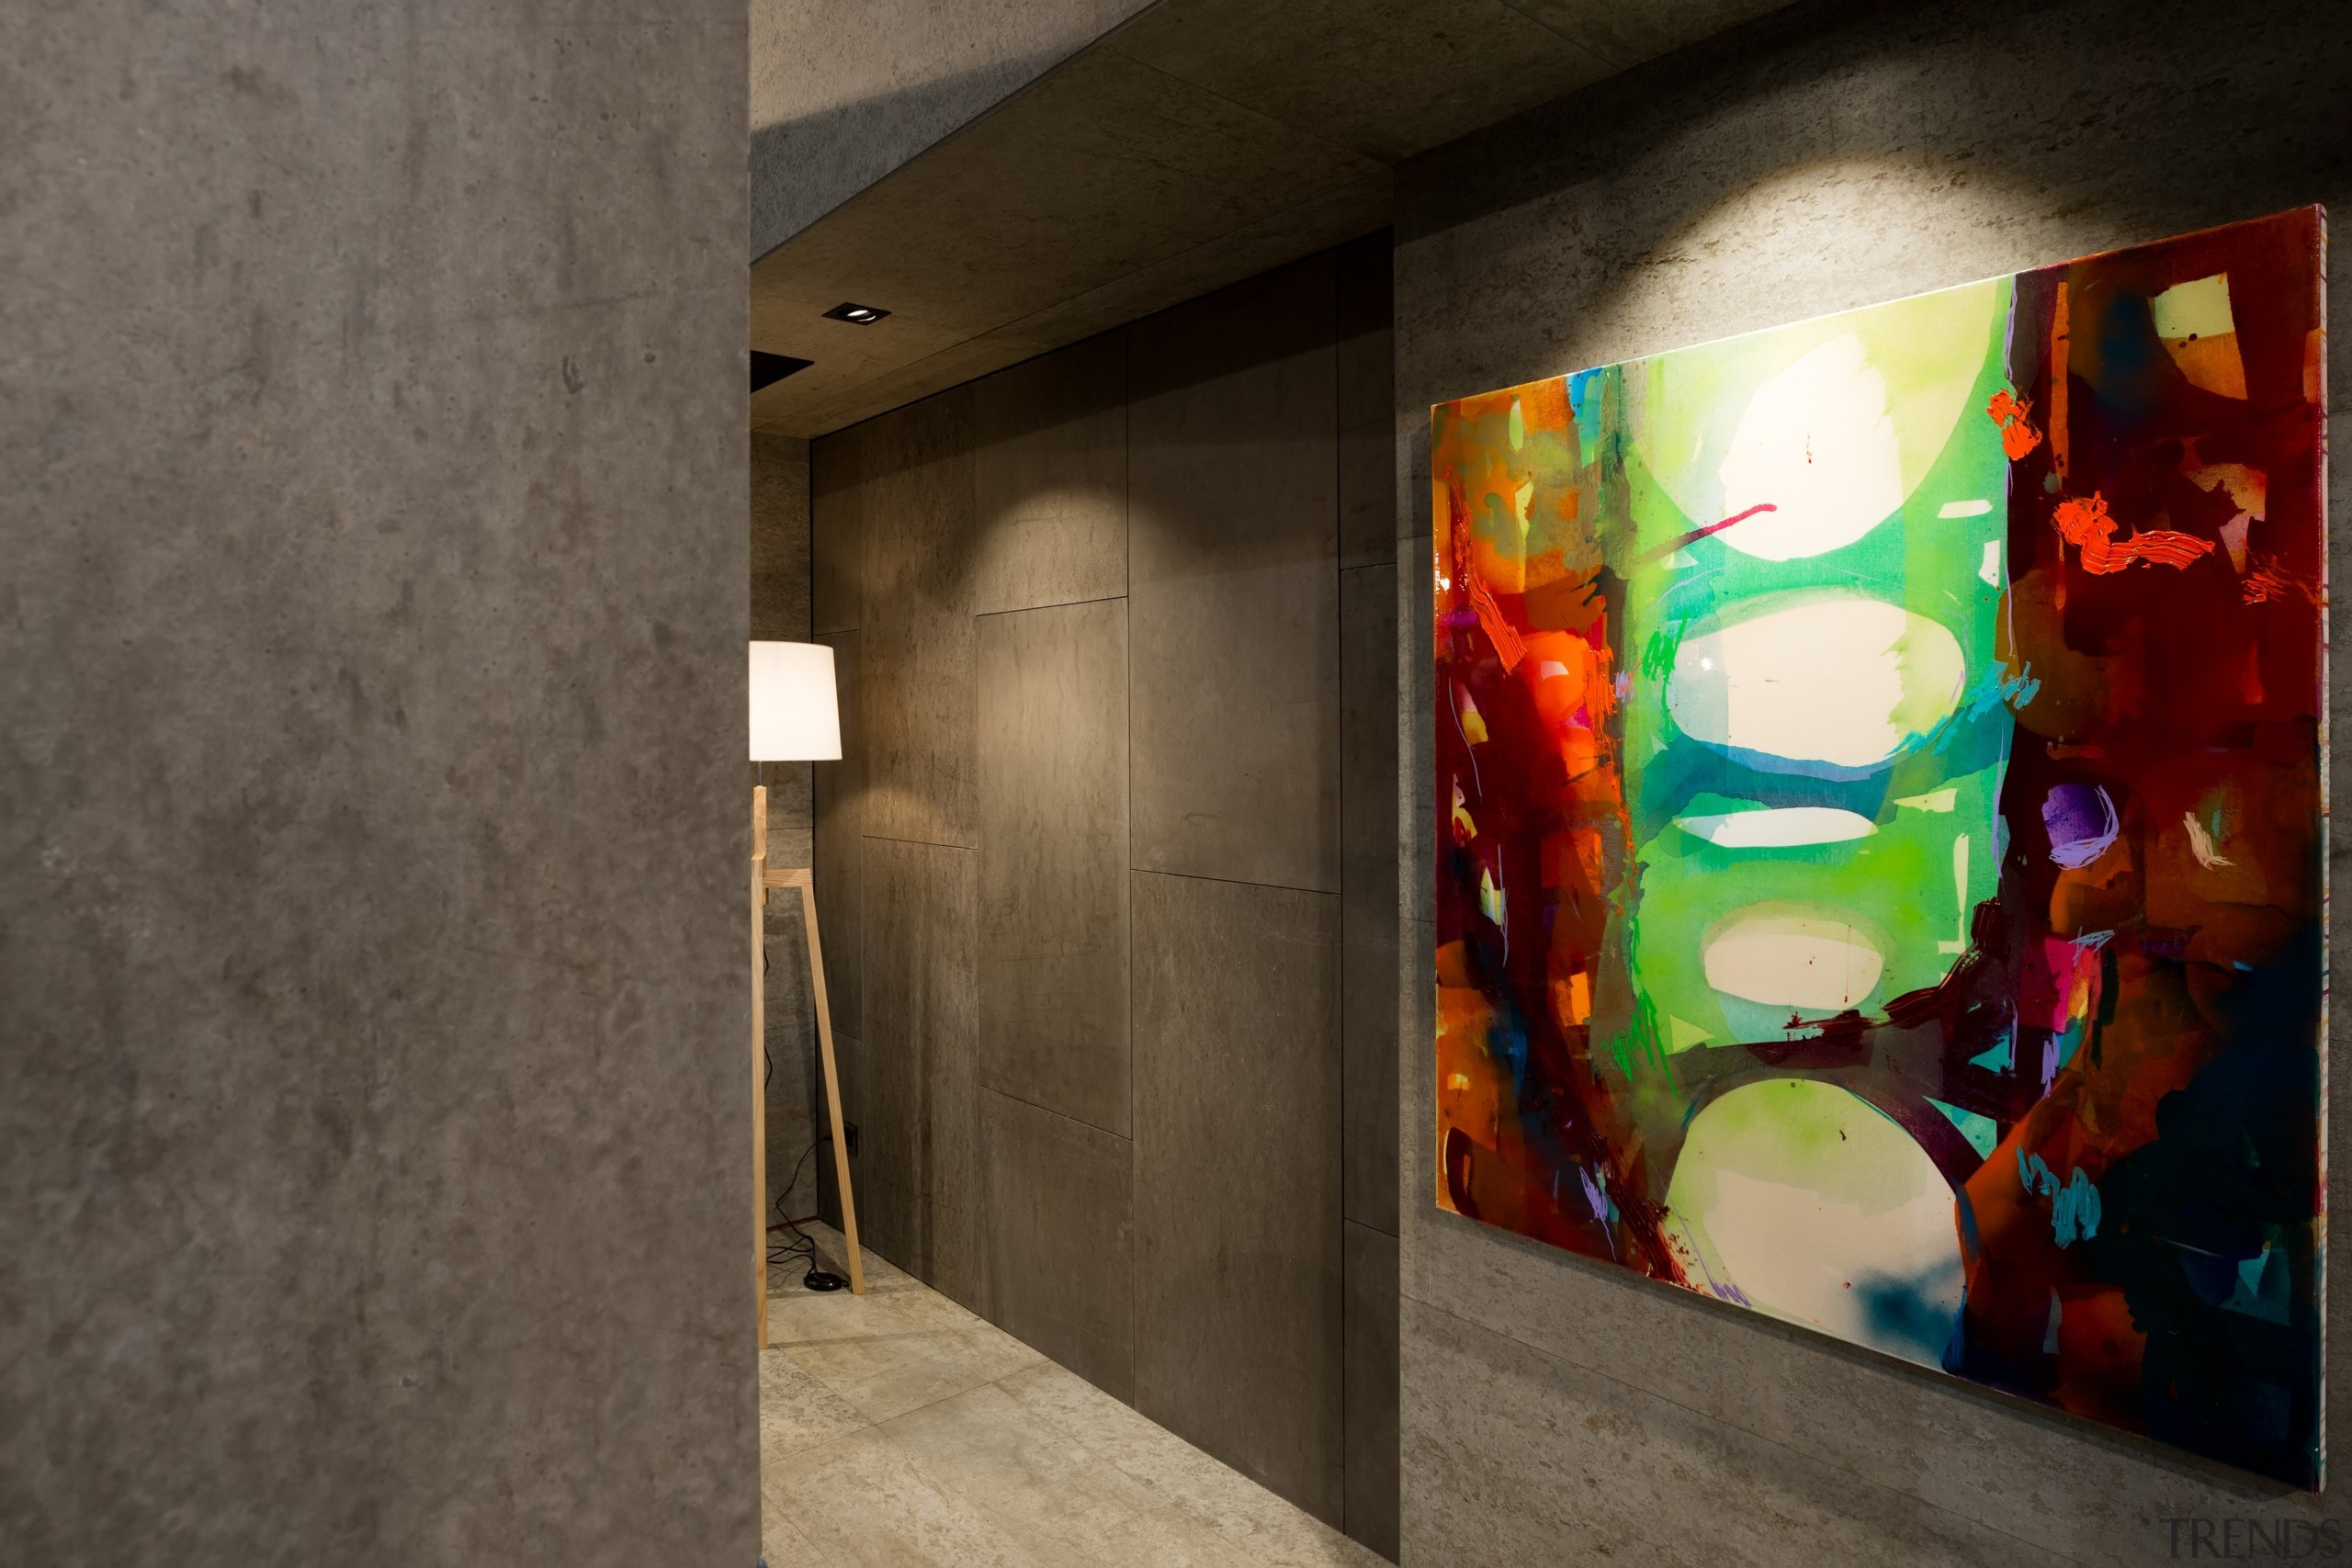 IMG_6193 - art | glass | interior design art, glass, interior design, modern art, wall, window, black, gray